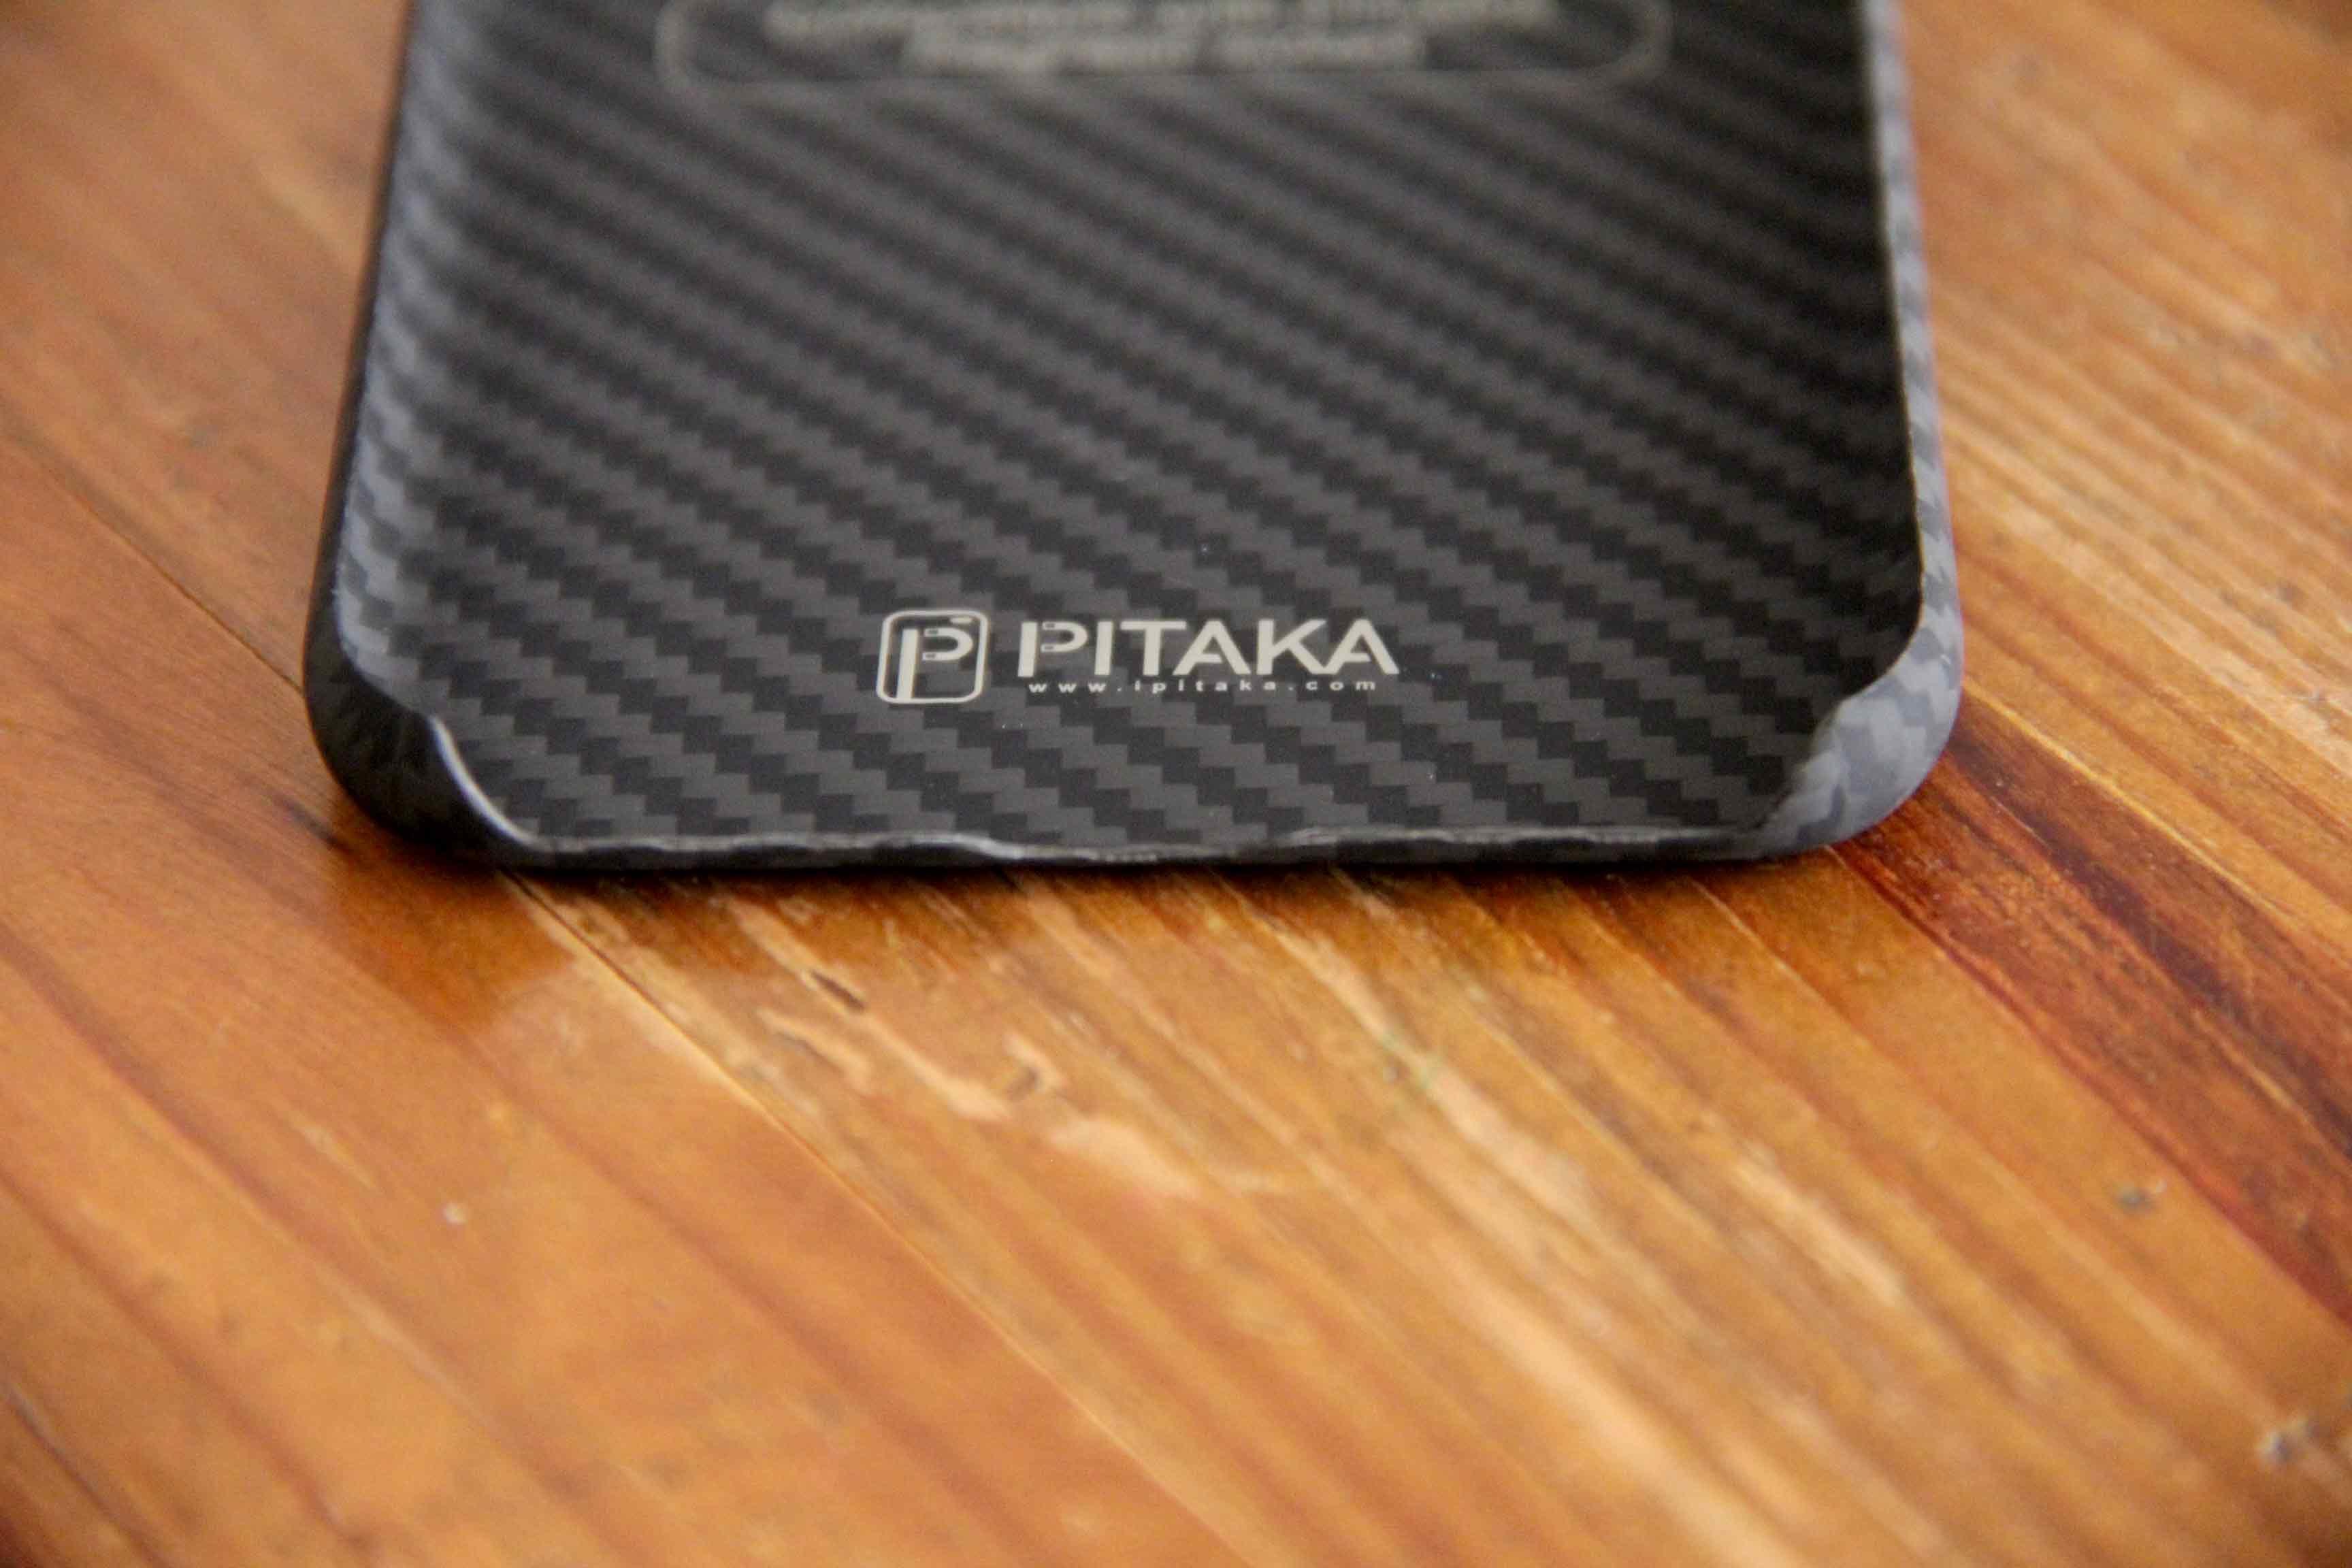 PITAKA iPhoneXケース下部の写真